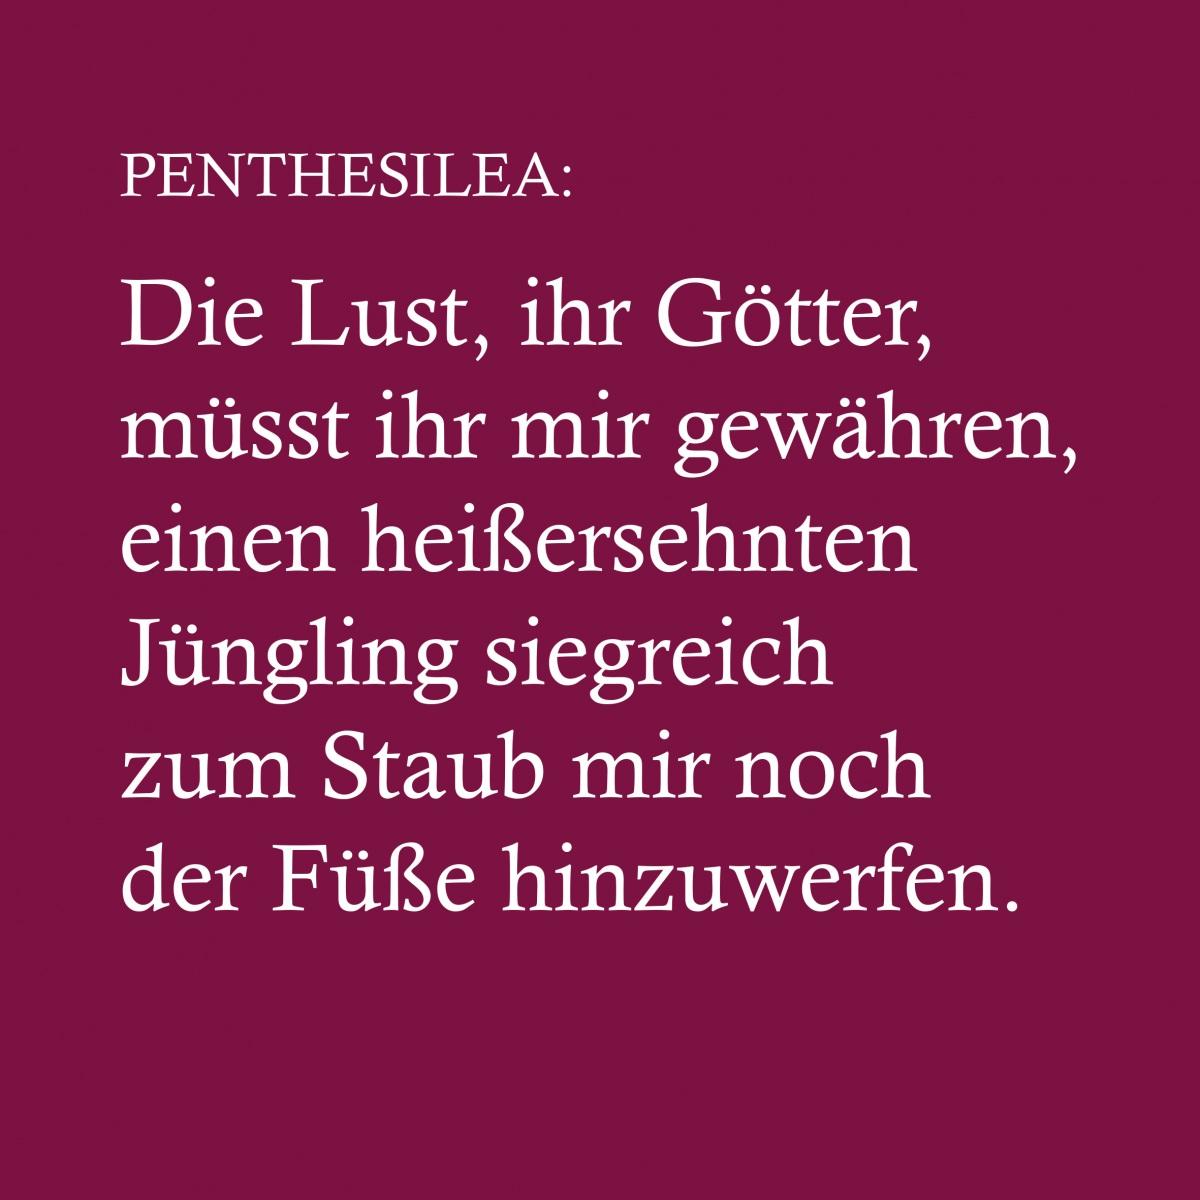 Projekt Penthesilea  Text Penthesilea // Laserdruck auf Karton, 20x20, 2020